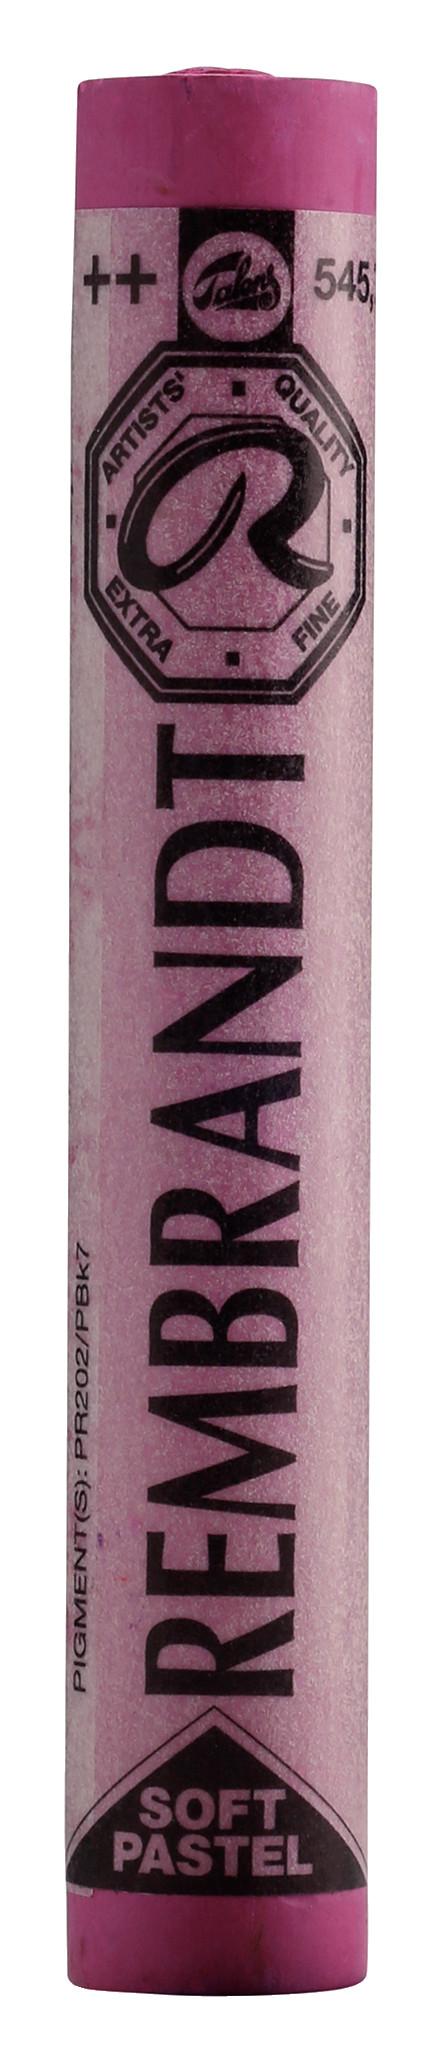 Rembrandt Soft Pastel Round Full Stick Red Violet(7) (545.7)